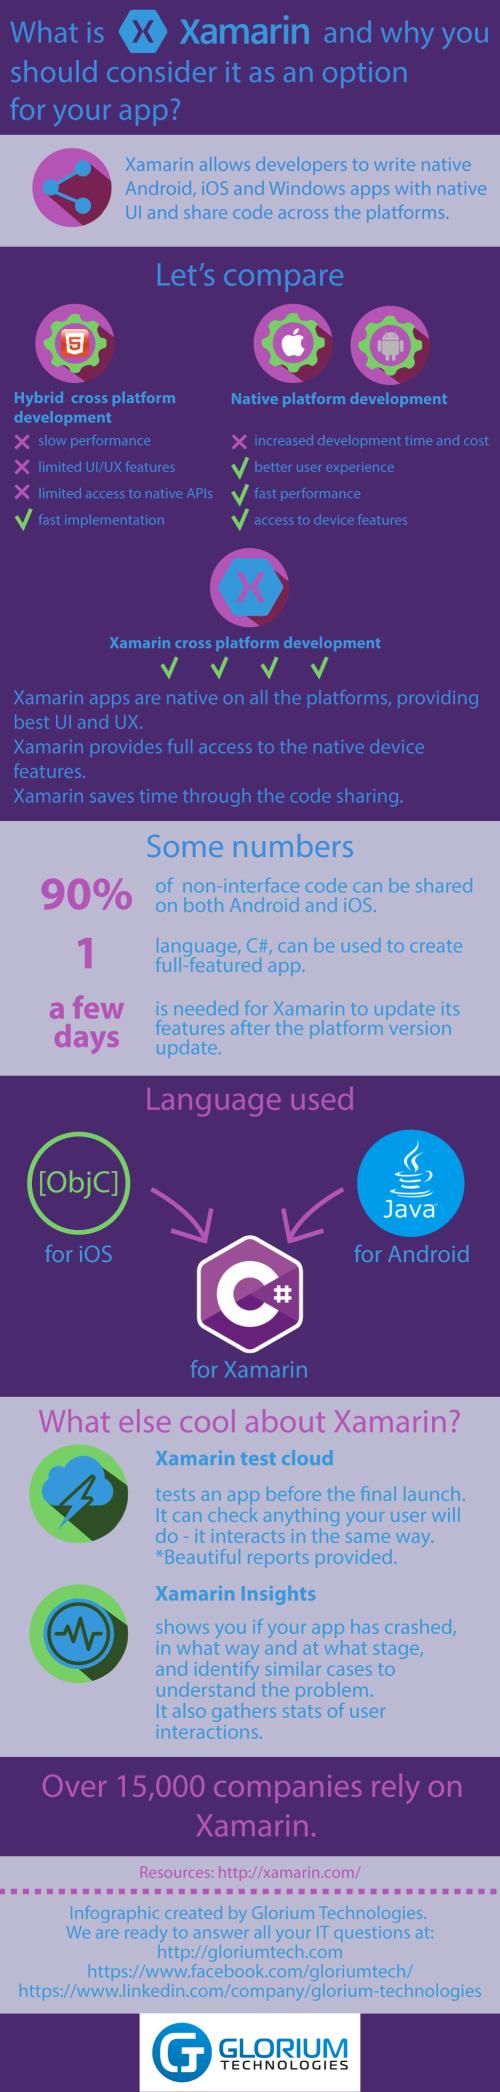 xamarin app development infographic